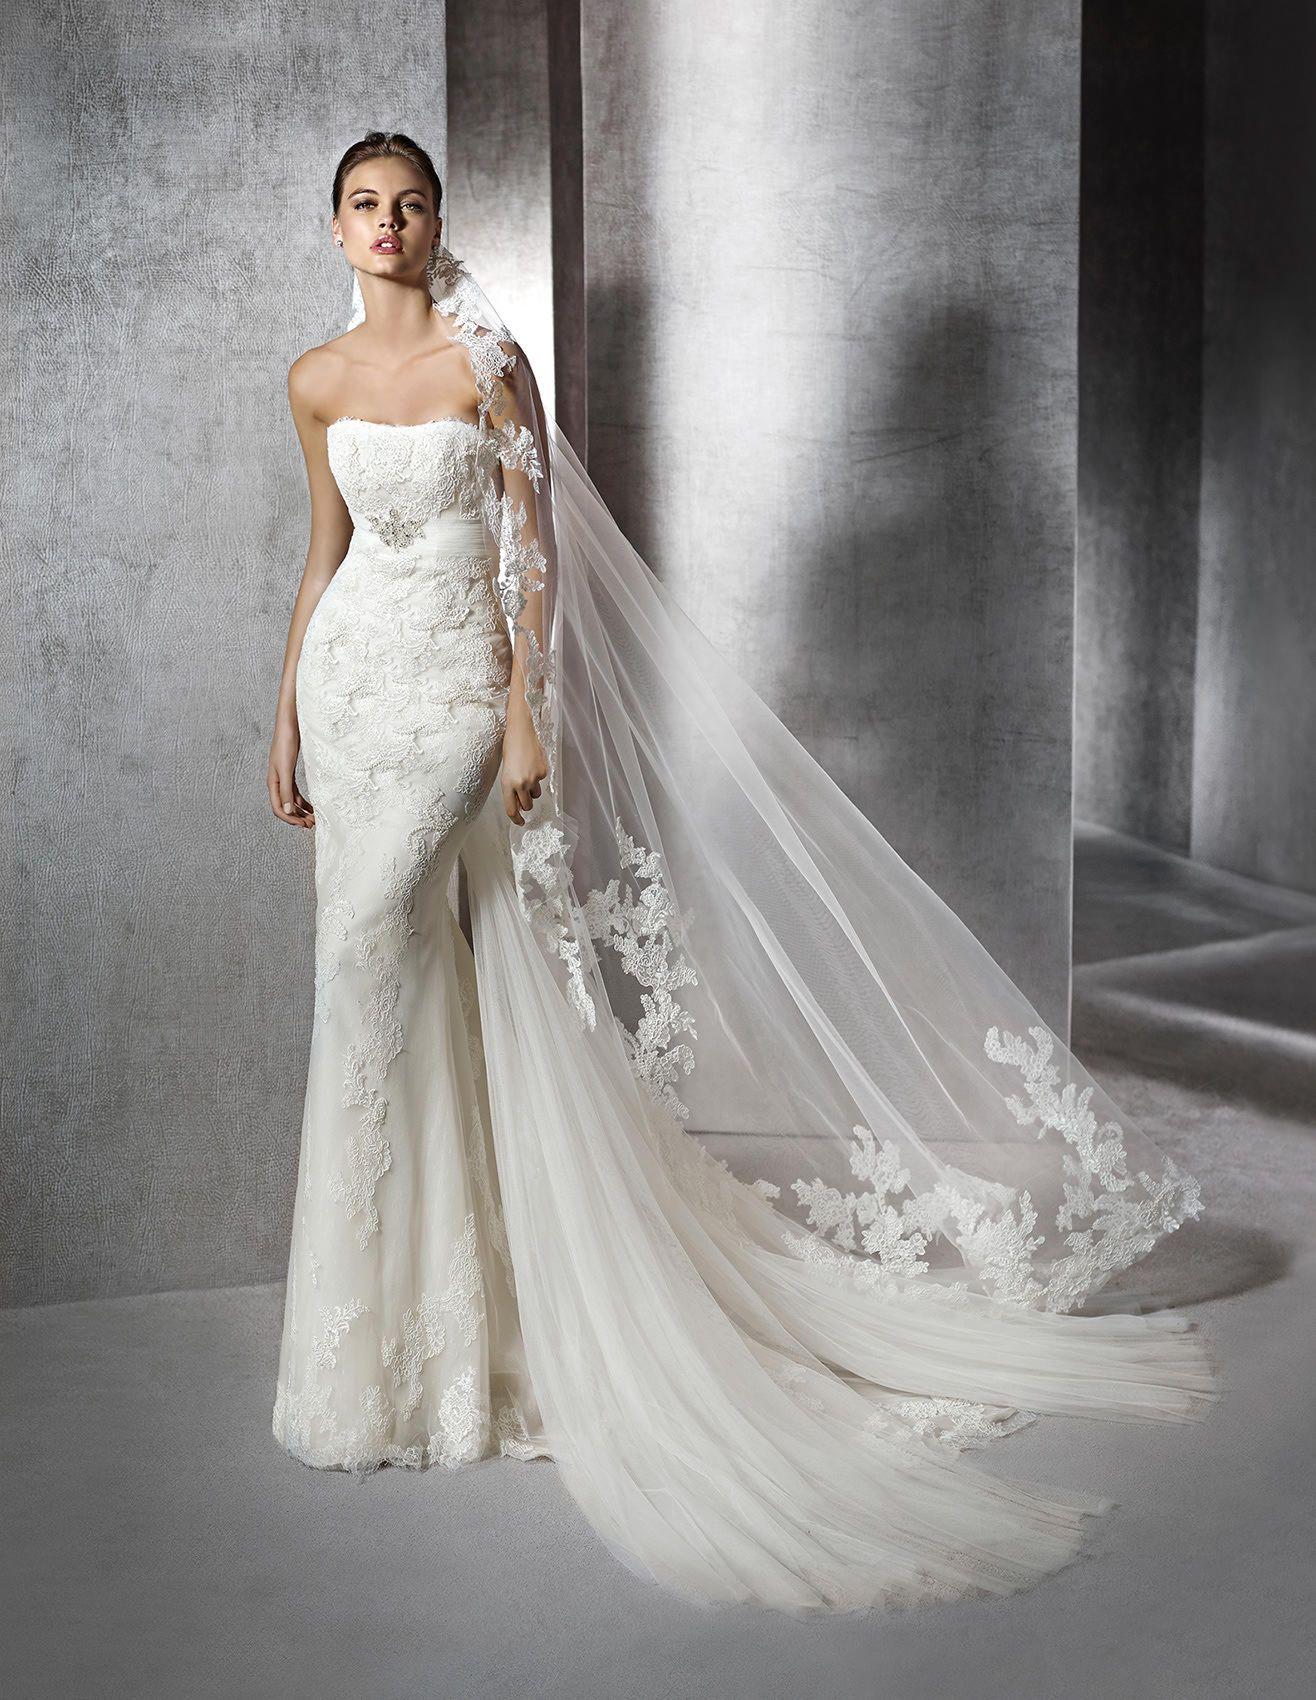 Marisa wedding dress  Abiti da sposa rovato brescia  wedding gowns  Pinterest  Mermaid